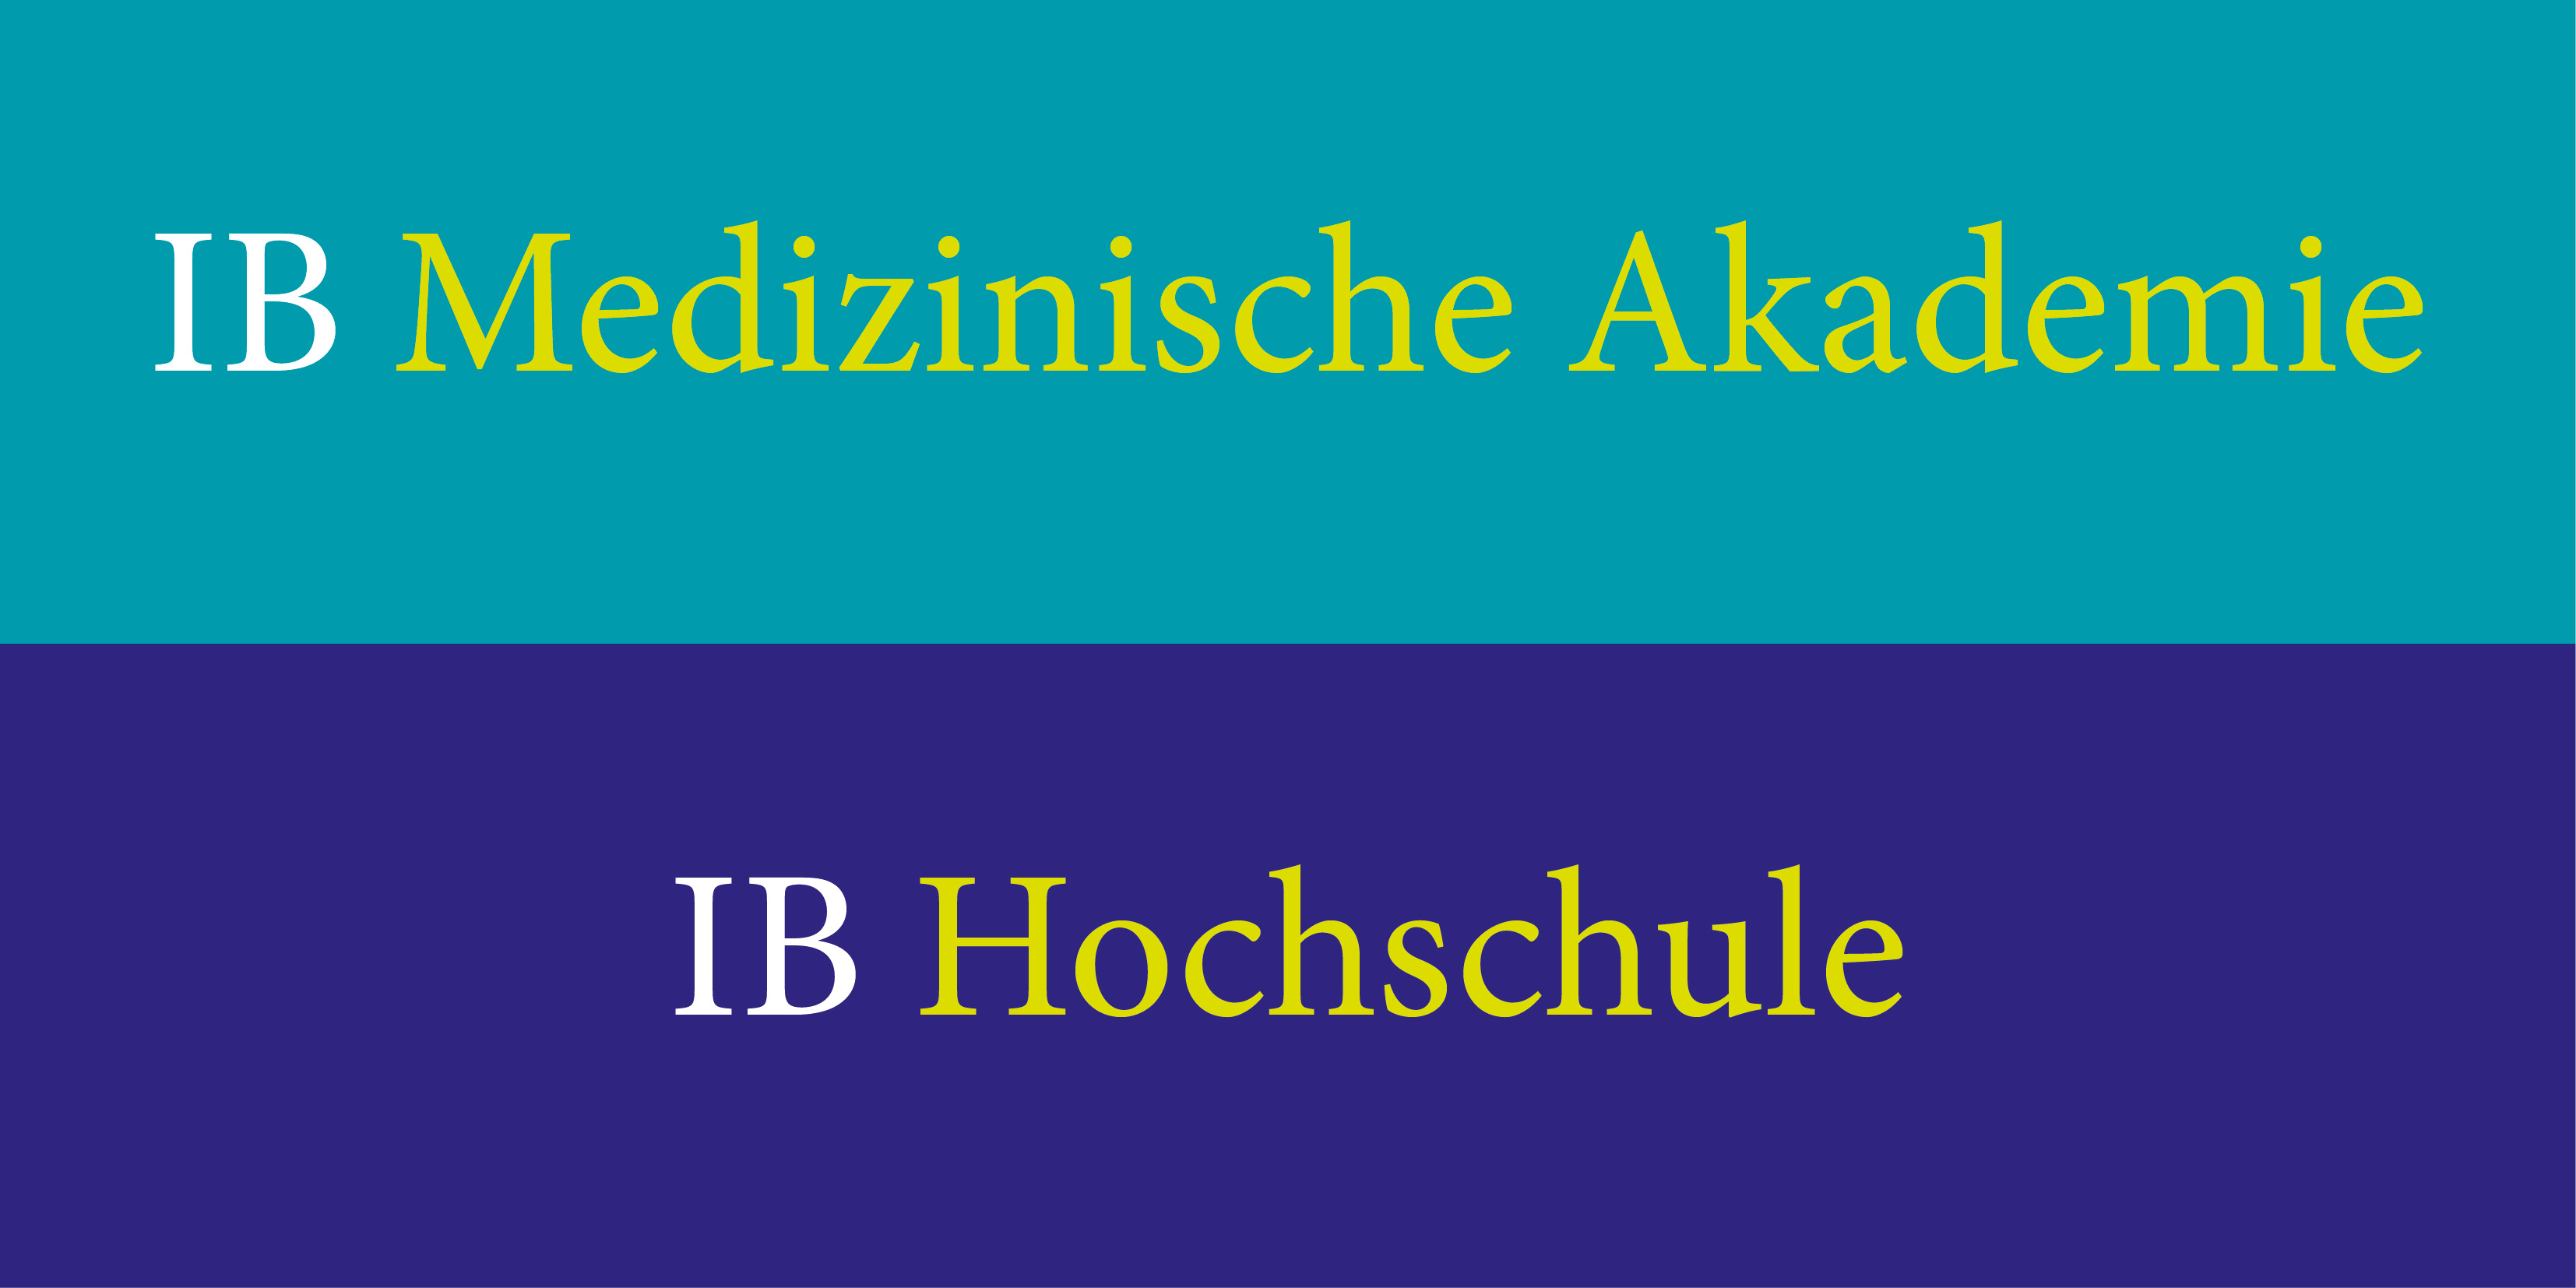 IB Medizinische Akademie / IB Hochschule